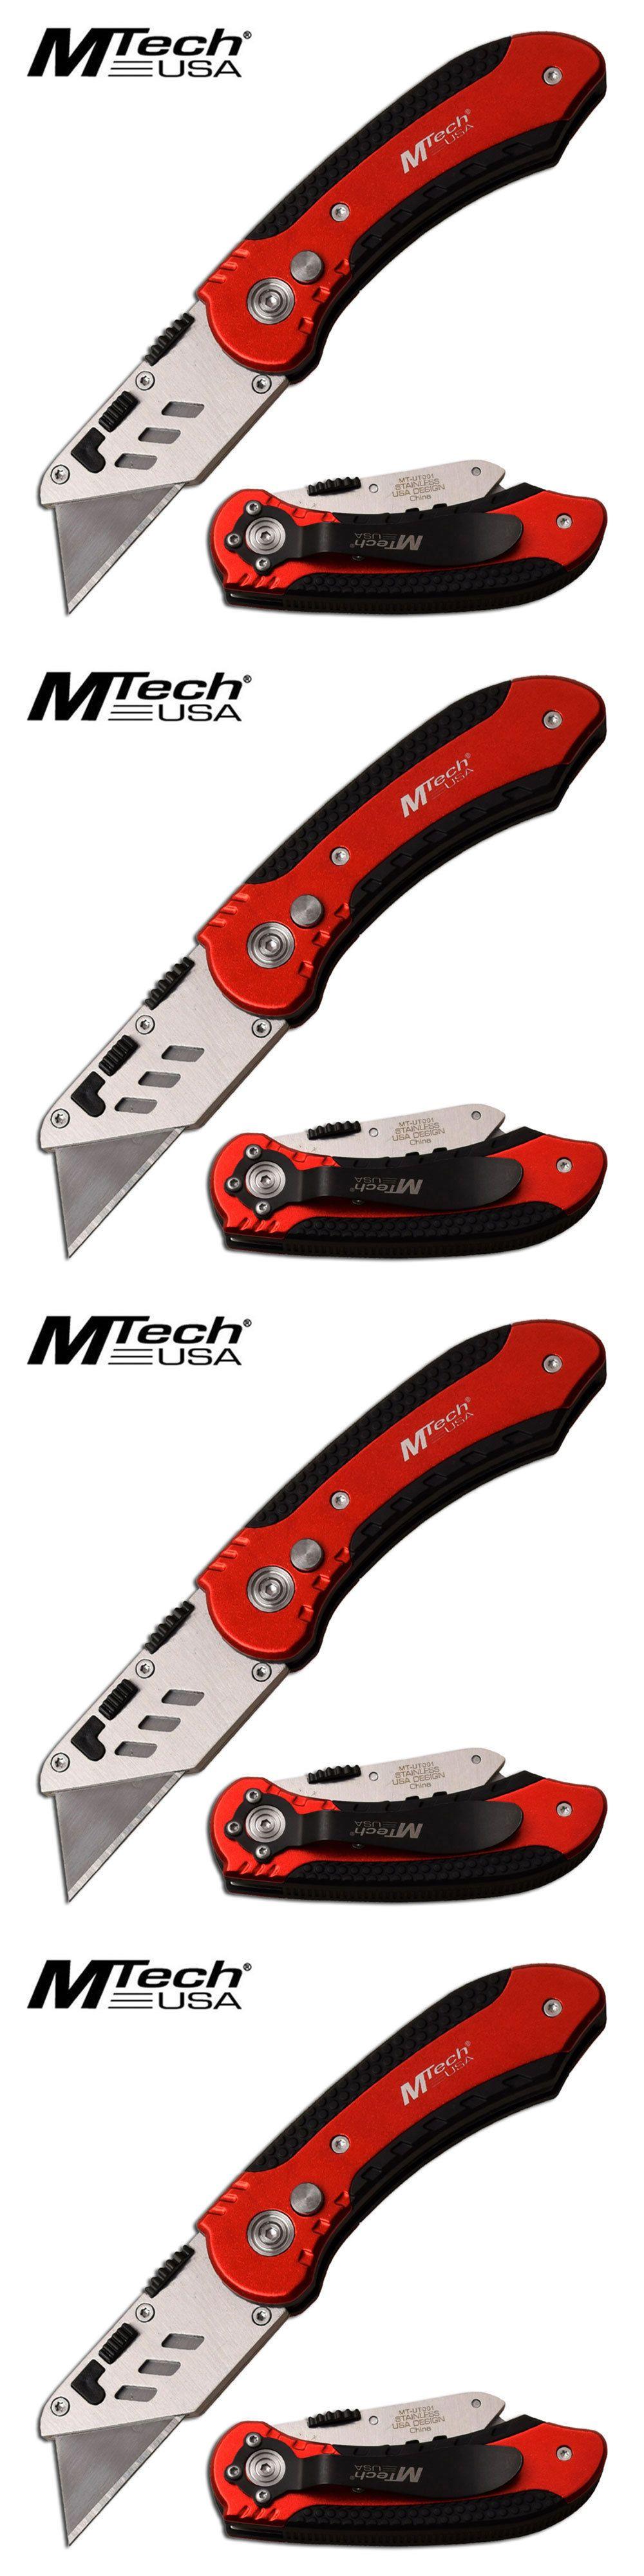 Knives And Blades 39057 Folding Utility Box Cutter Razor Blade Pocket Knife Hvac Sheetrock Plumber Tool Buy It Now Only Box Cutter Utility Box Razor Blades